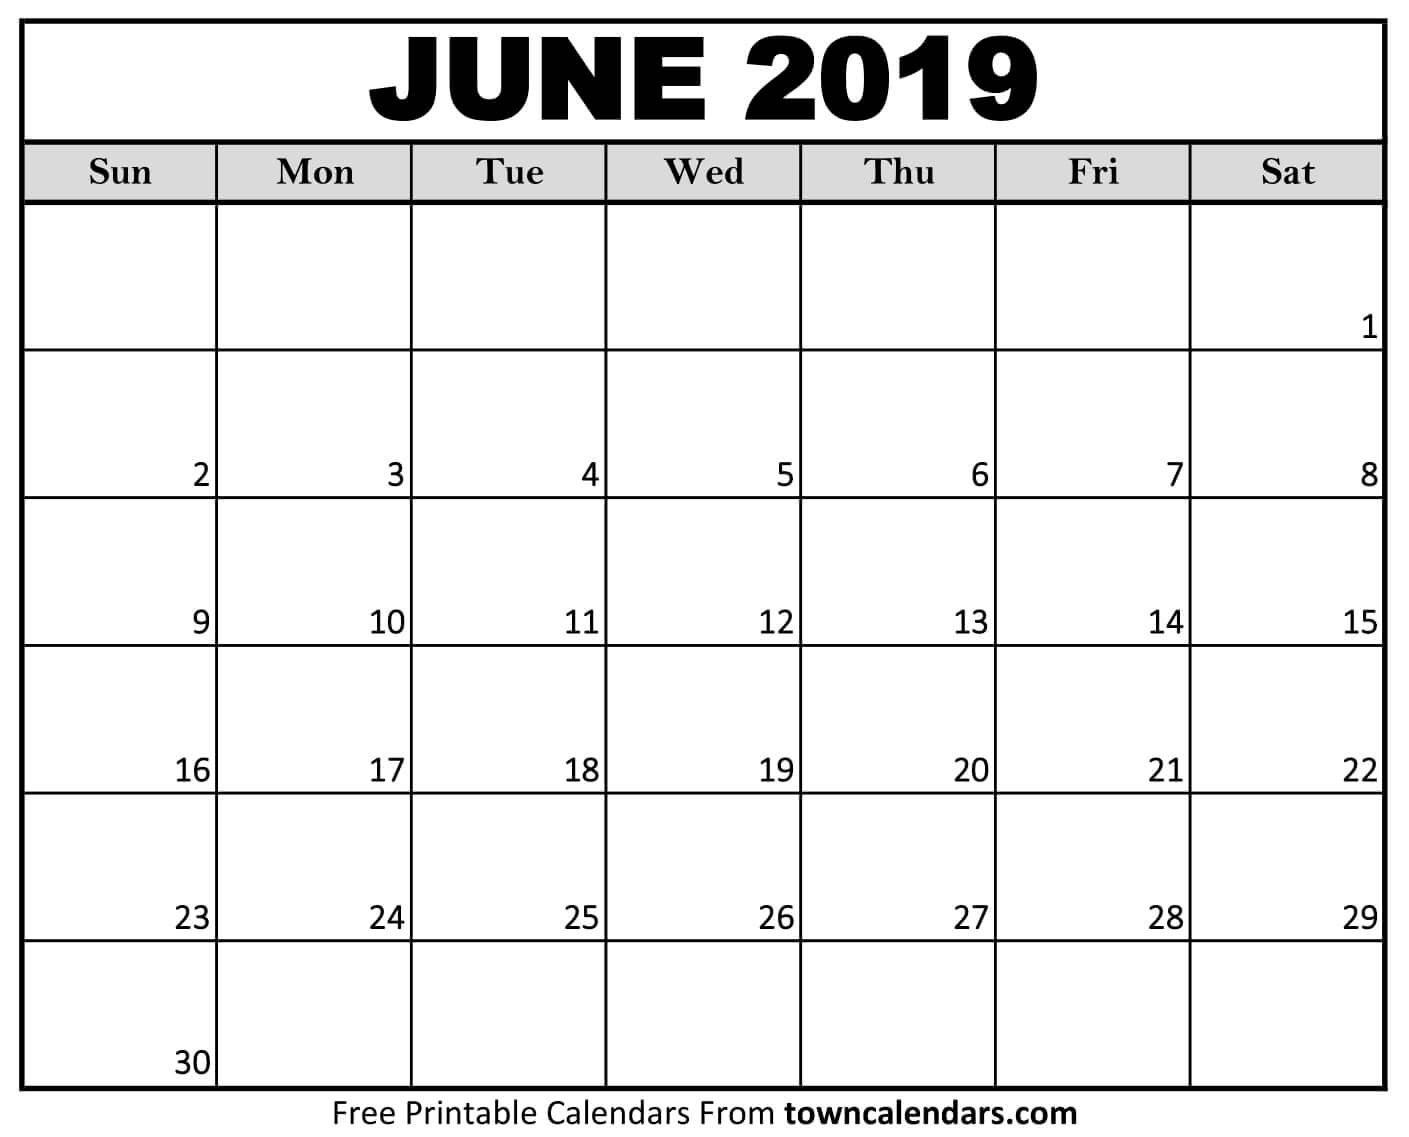 Printable June 2019 Calendar – Towncalendars June 2 2019 Calendar